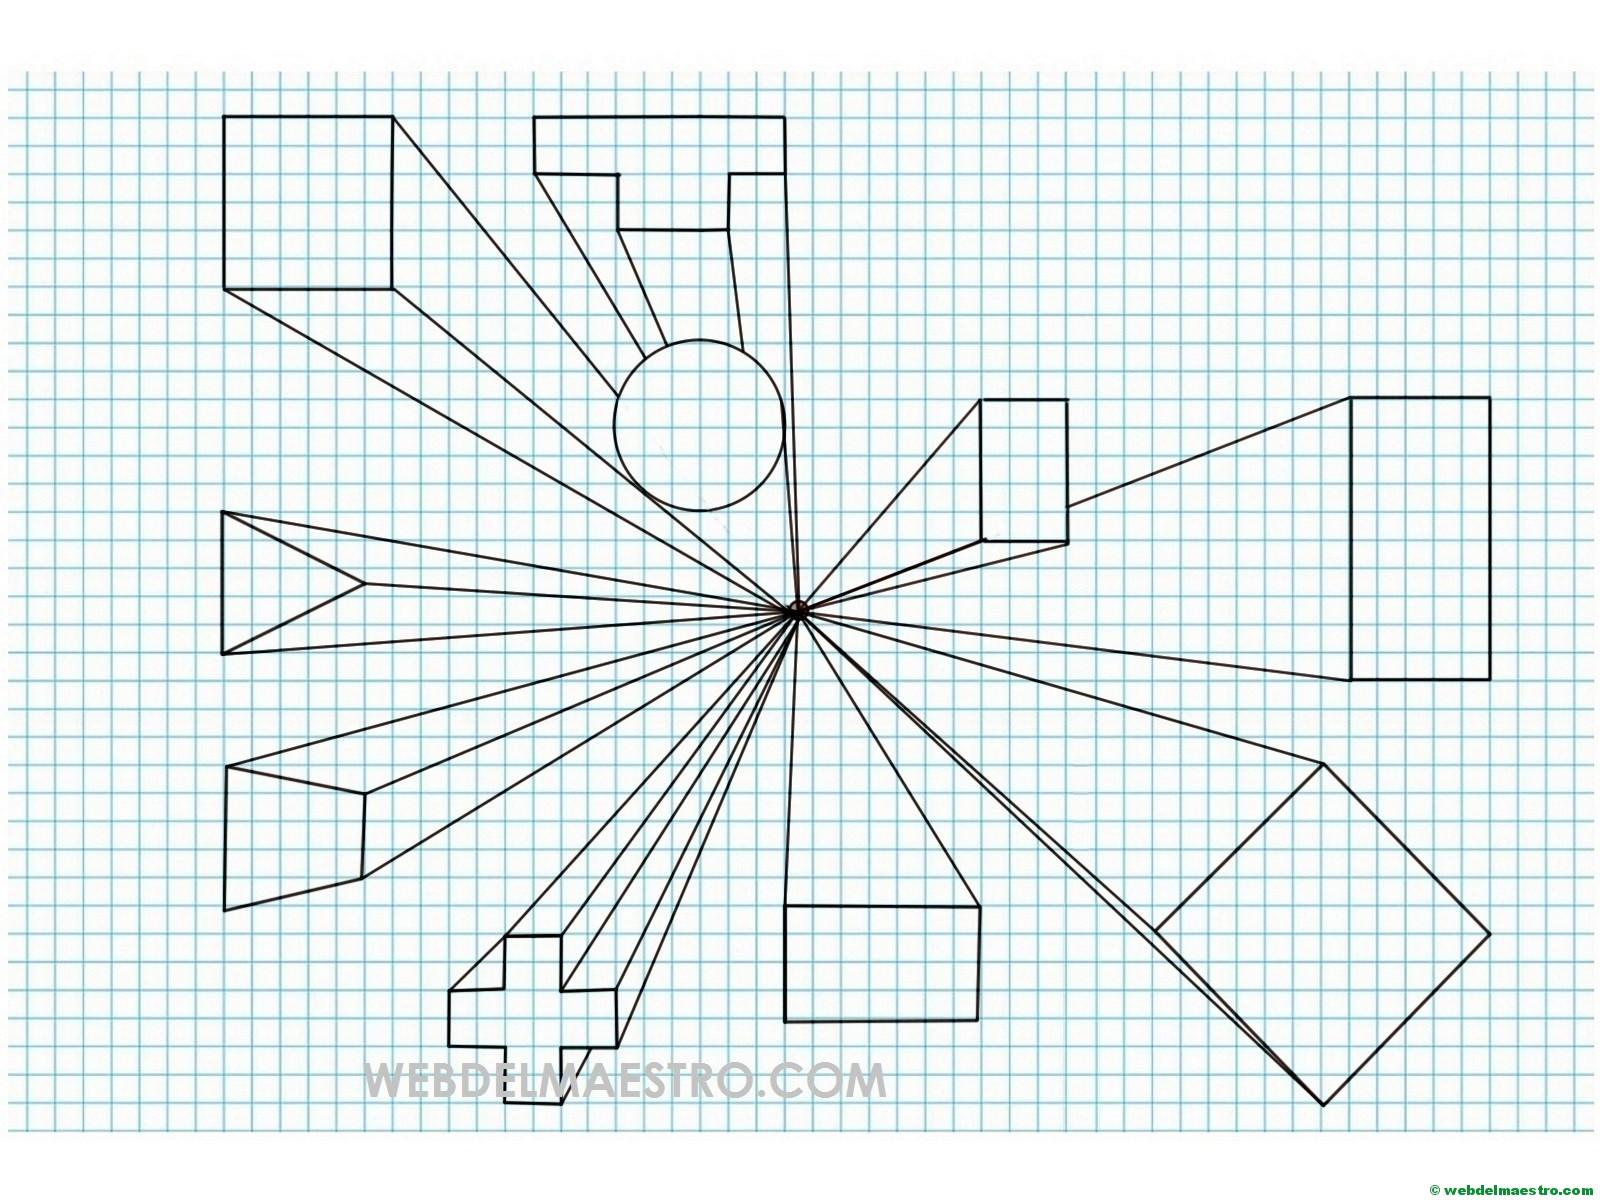 Perspectiva cónica | Dibujos paso a paso - Web del maestro